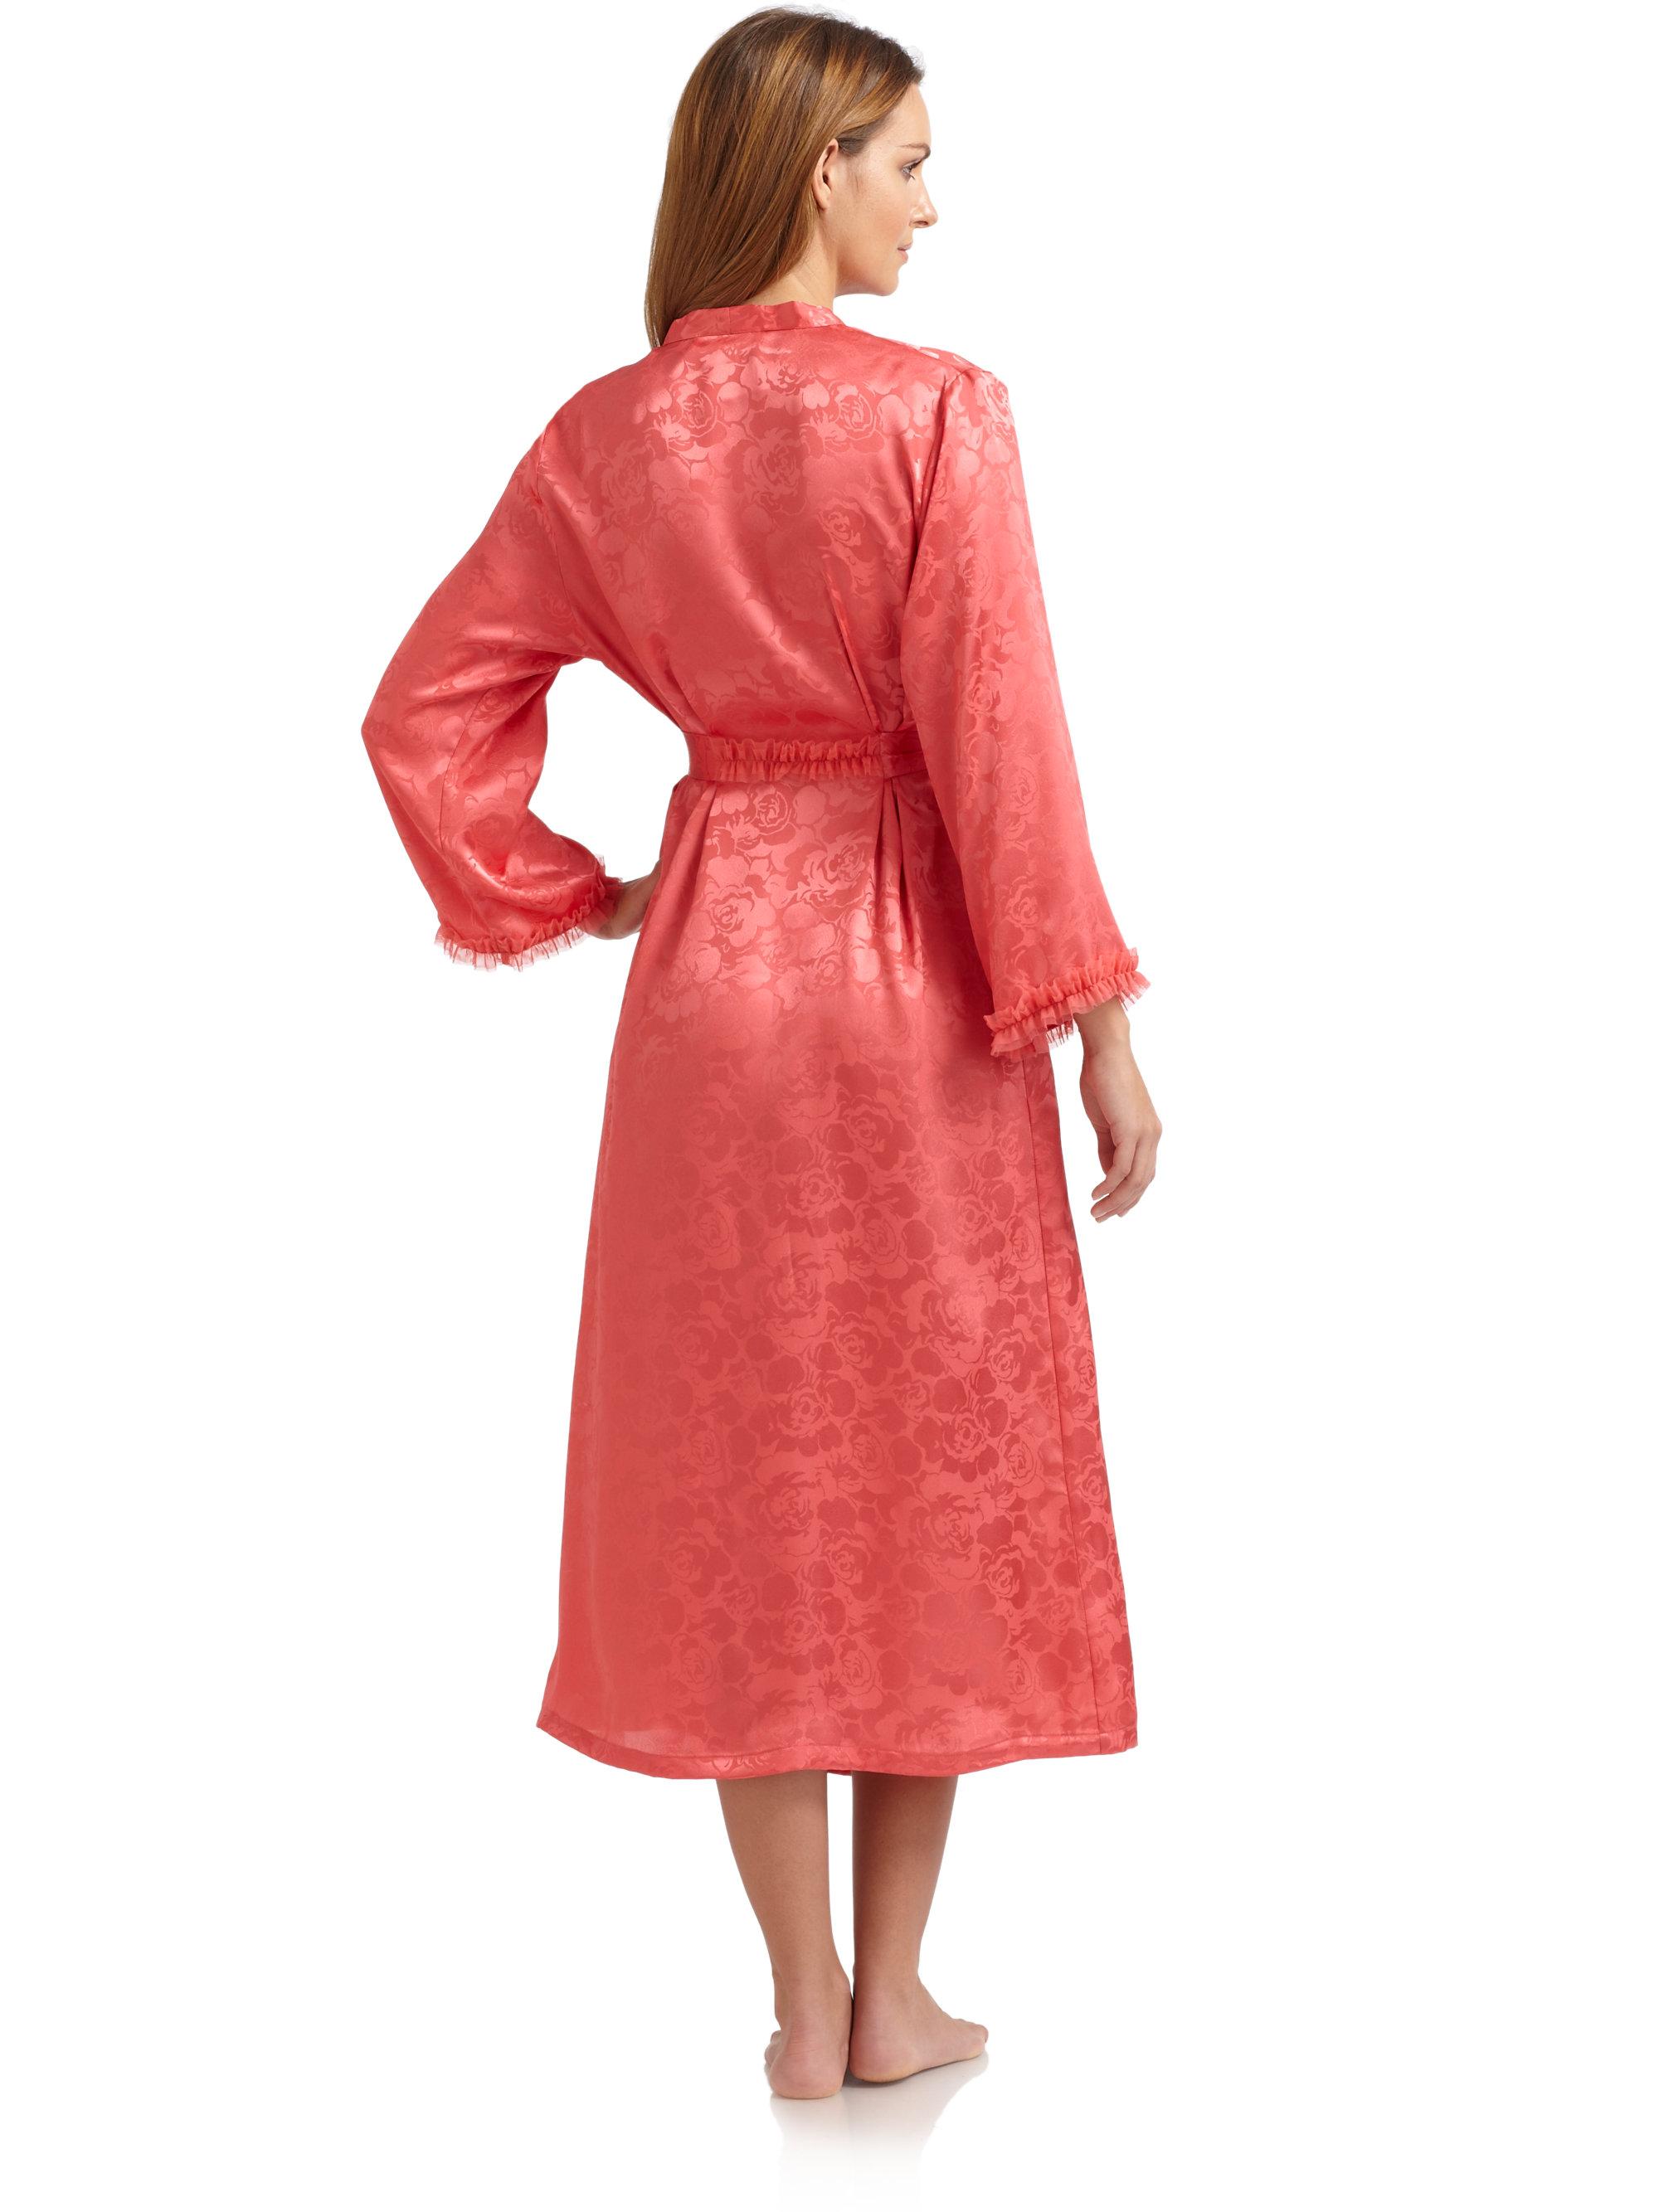 Oscar de la renta etched rose print robe in red lyst for Robes de mariage de betsey johnson